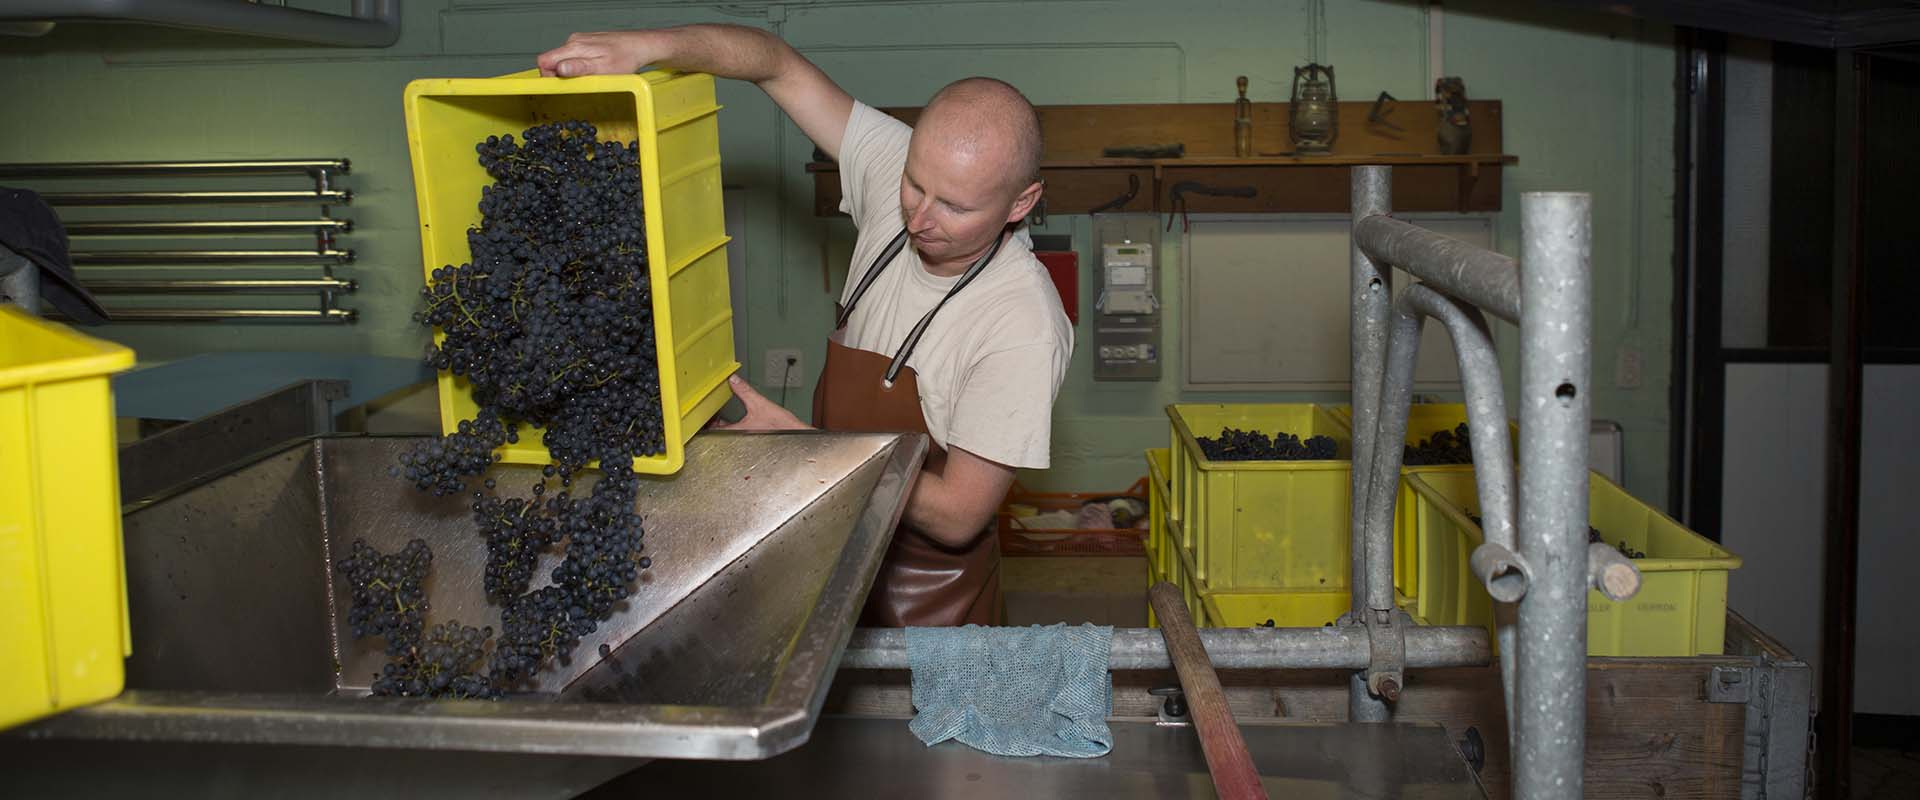 Weingut Rütihof - Monat Oktober